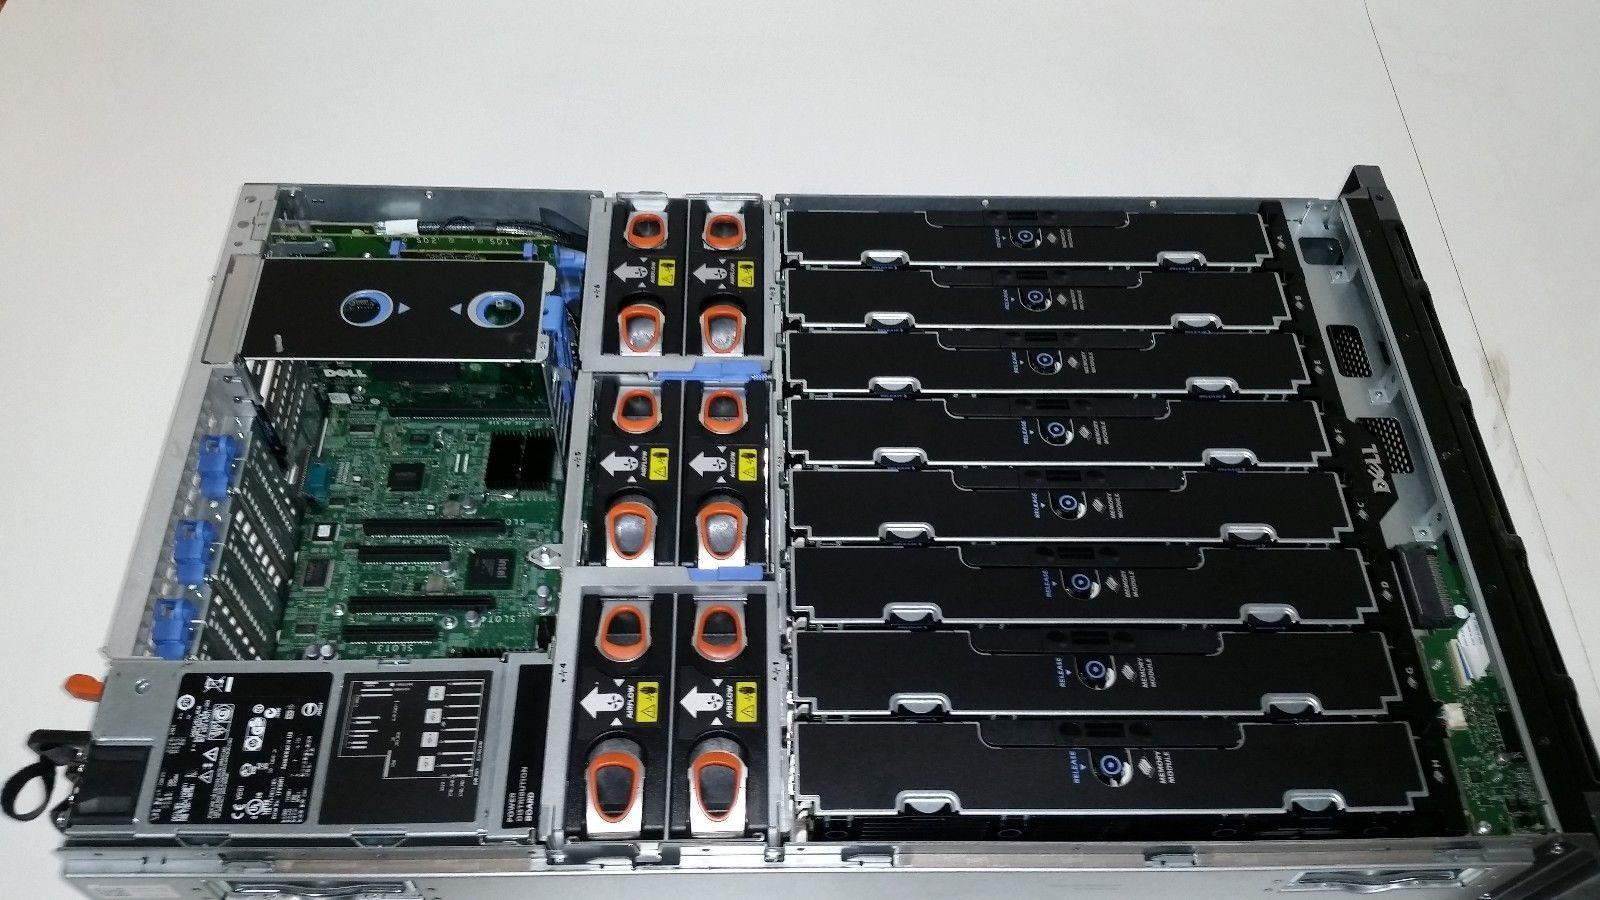 Dell Poweredge R910 4x Xeon X7550 2ghz 8 Core 64gb Ram